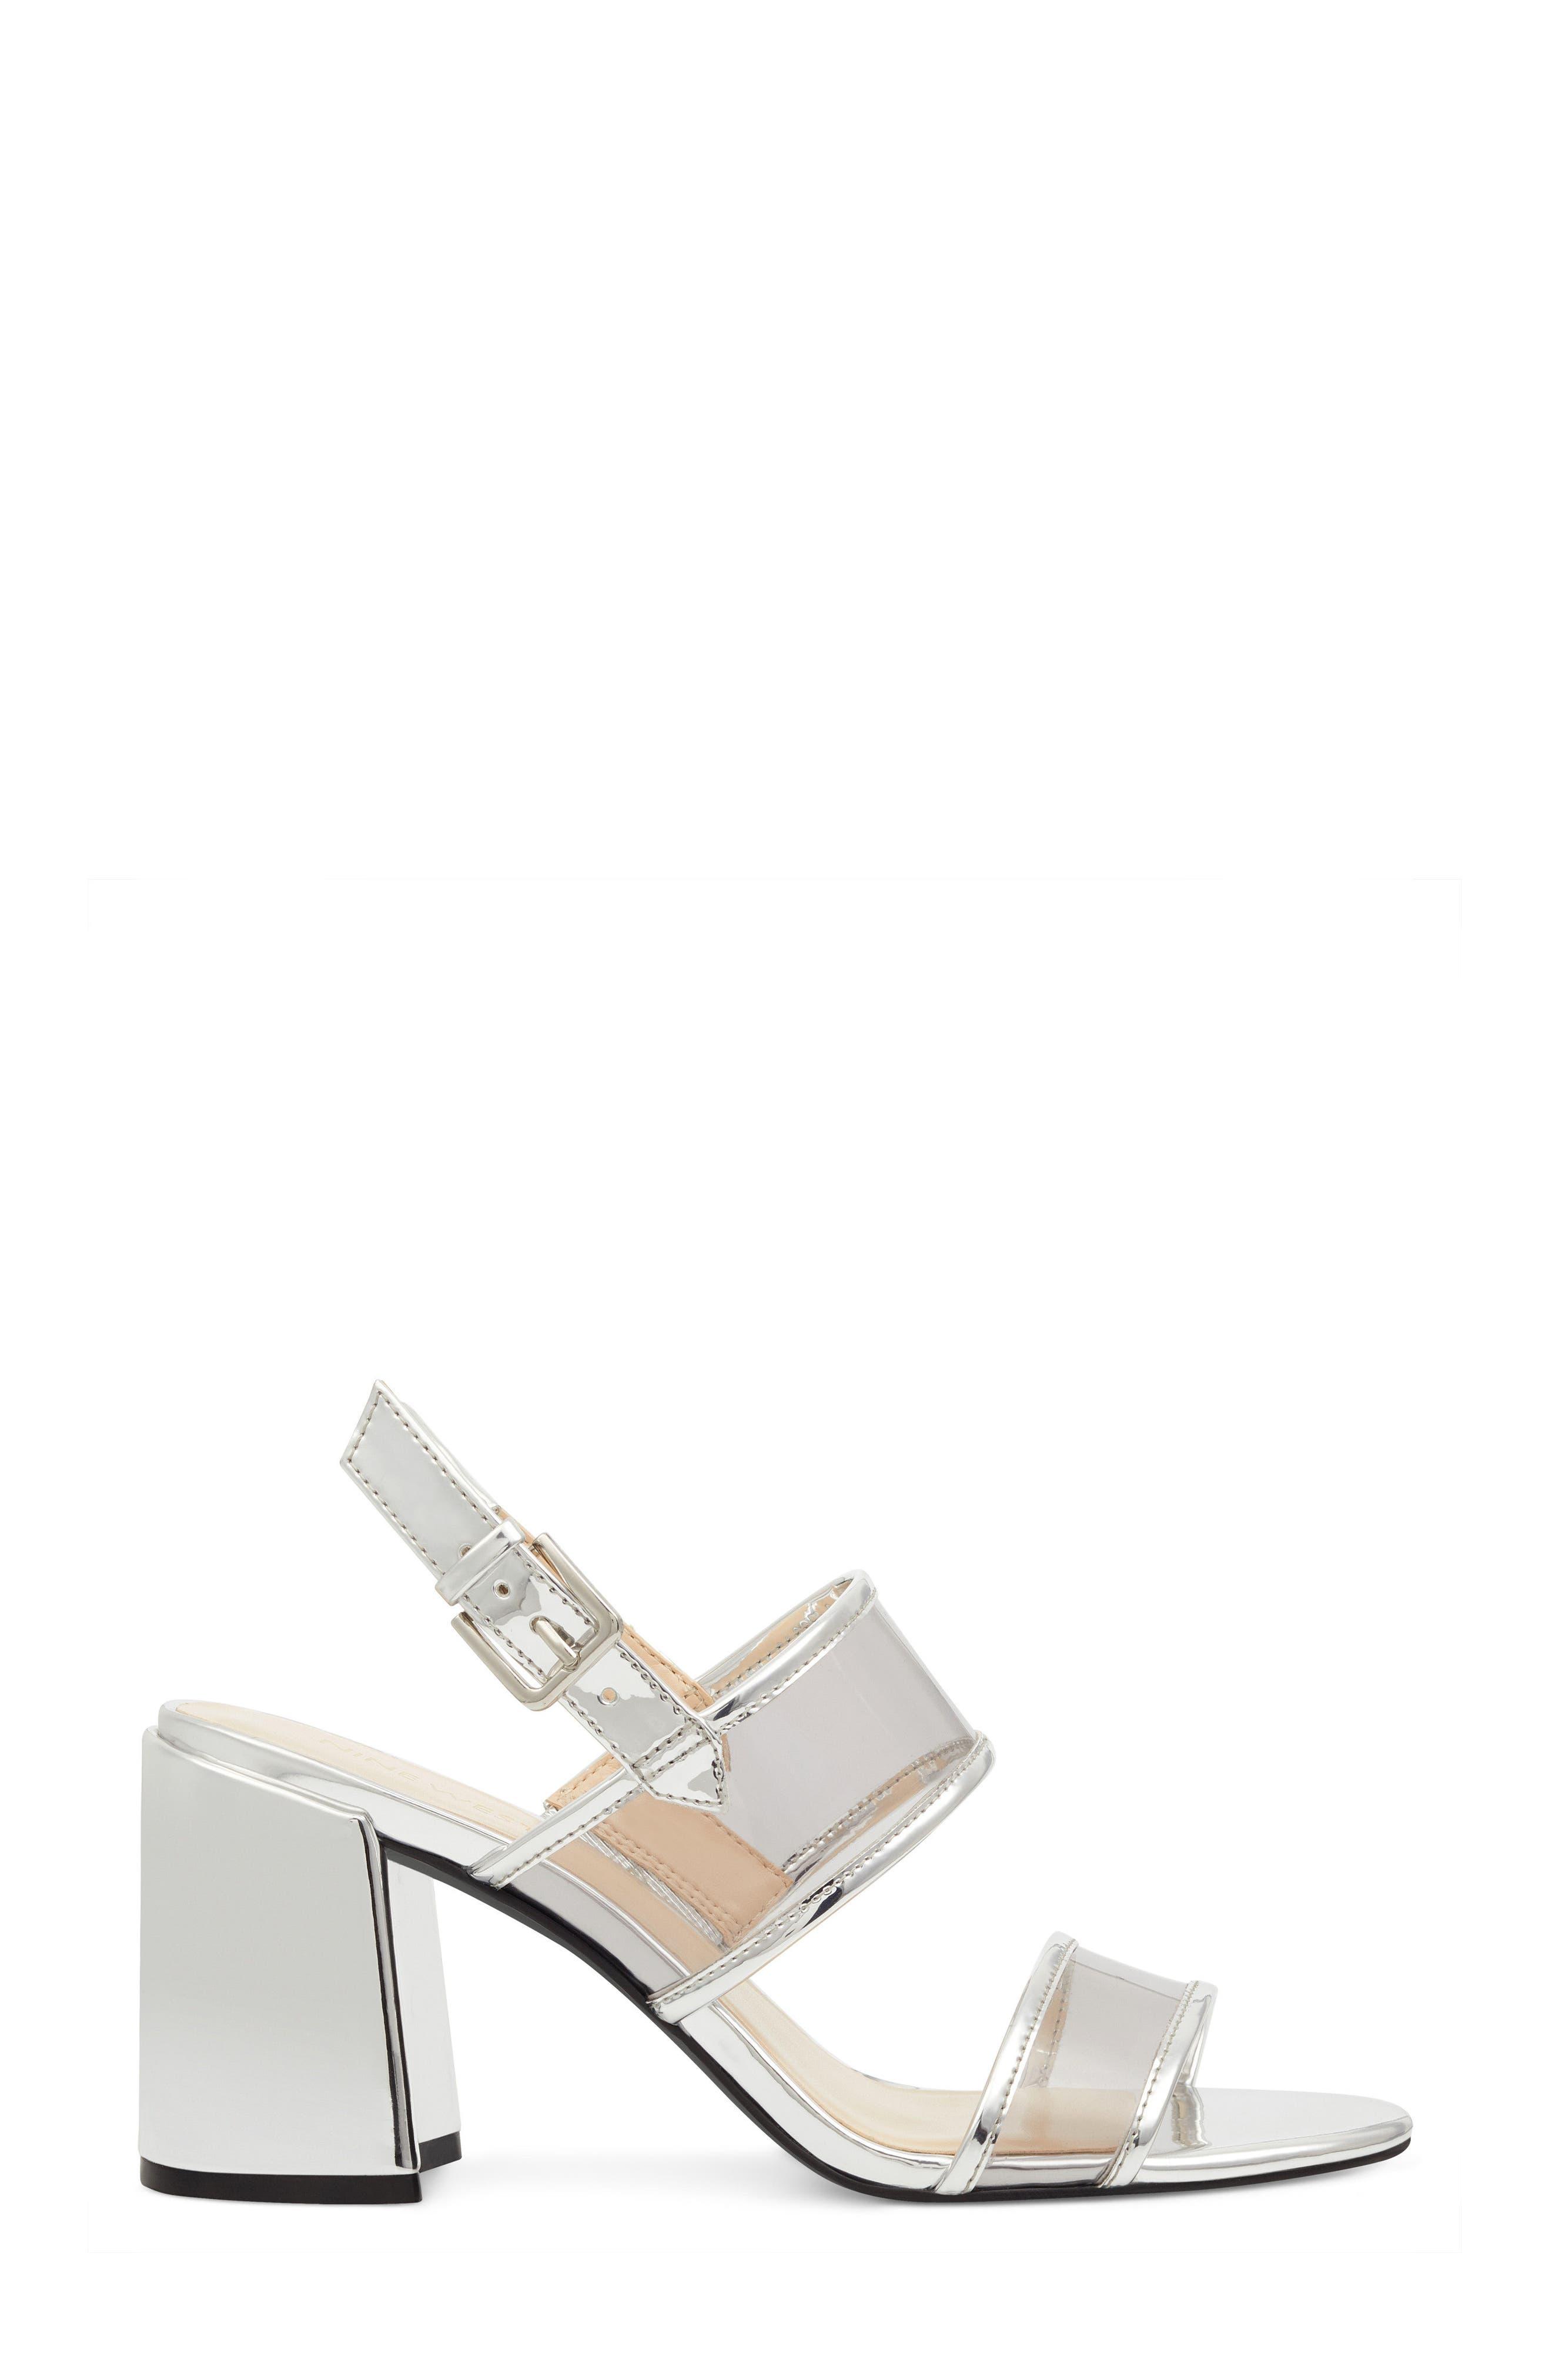 Gourdes Block Heel Sandal,                             Alternate thumbnail 3, color,                             021